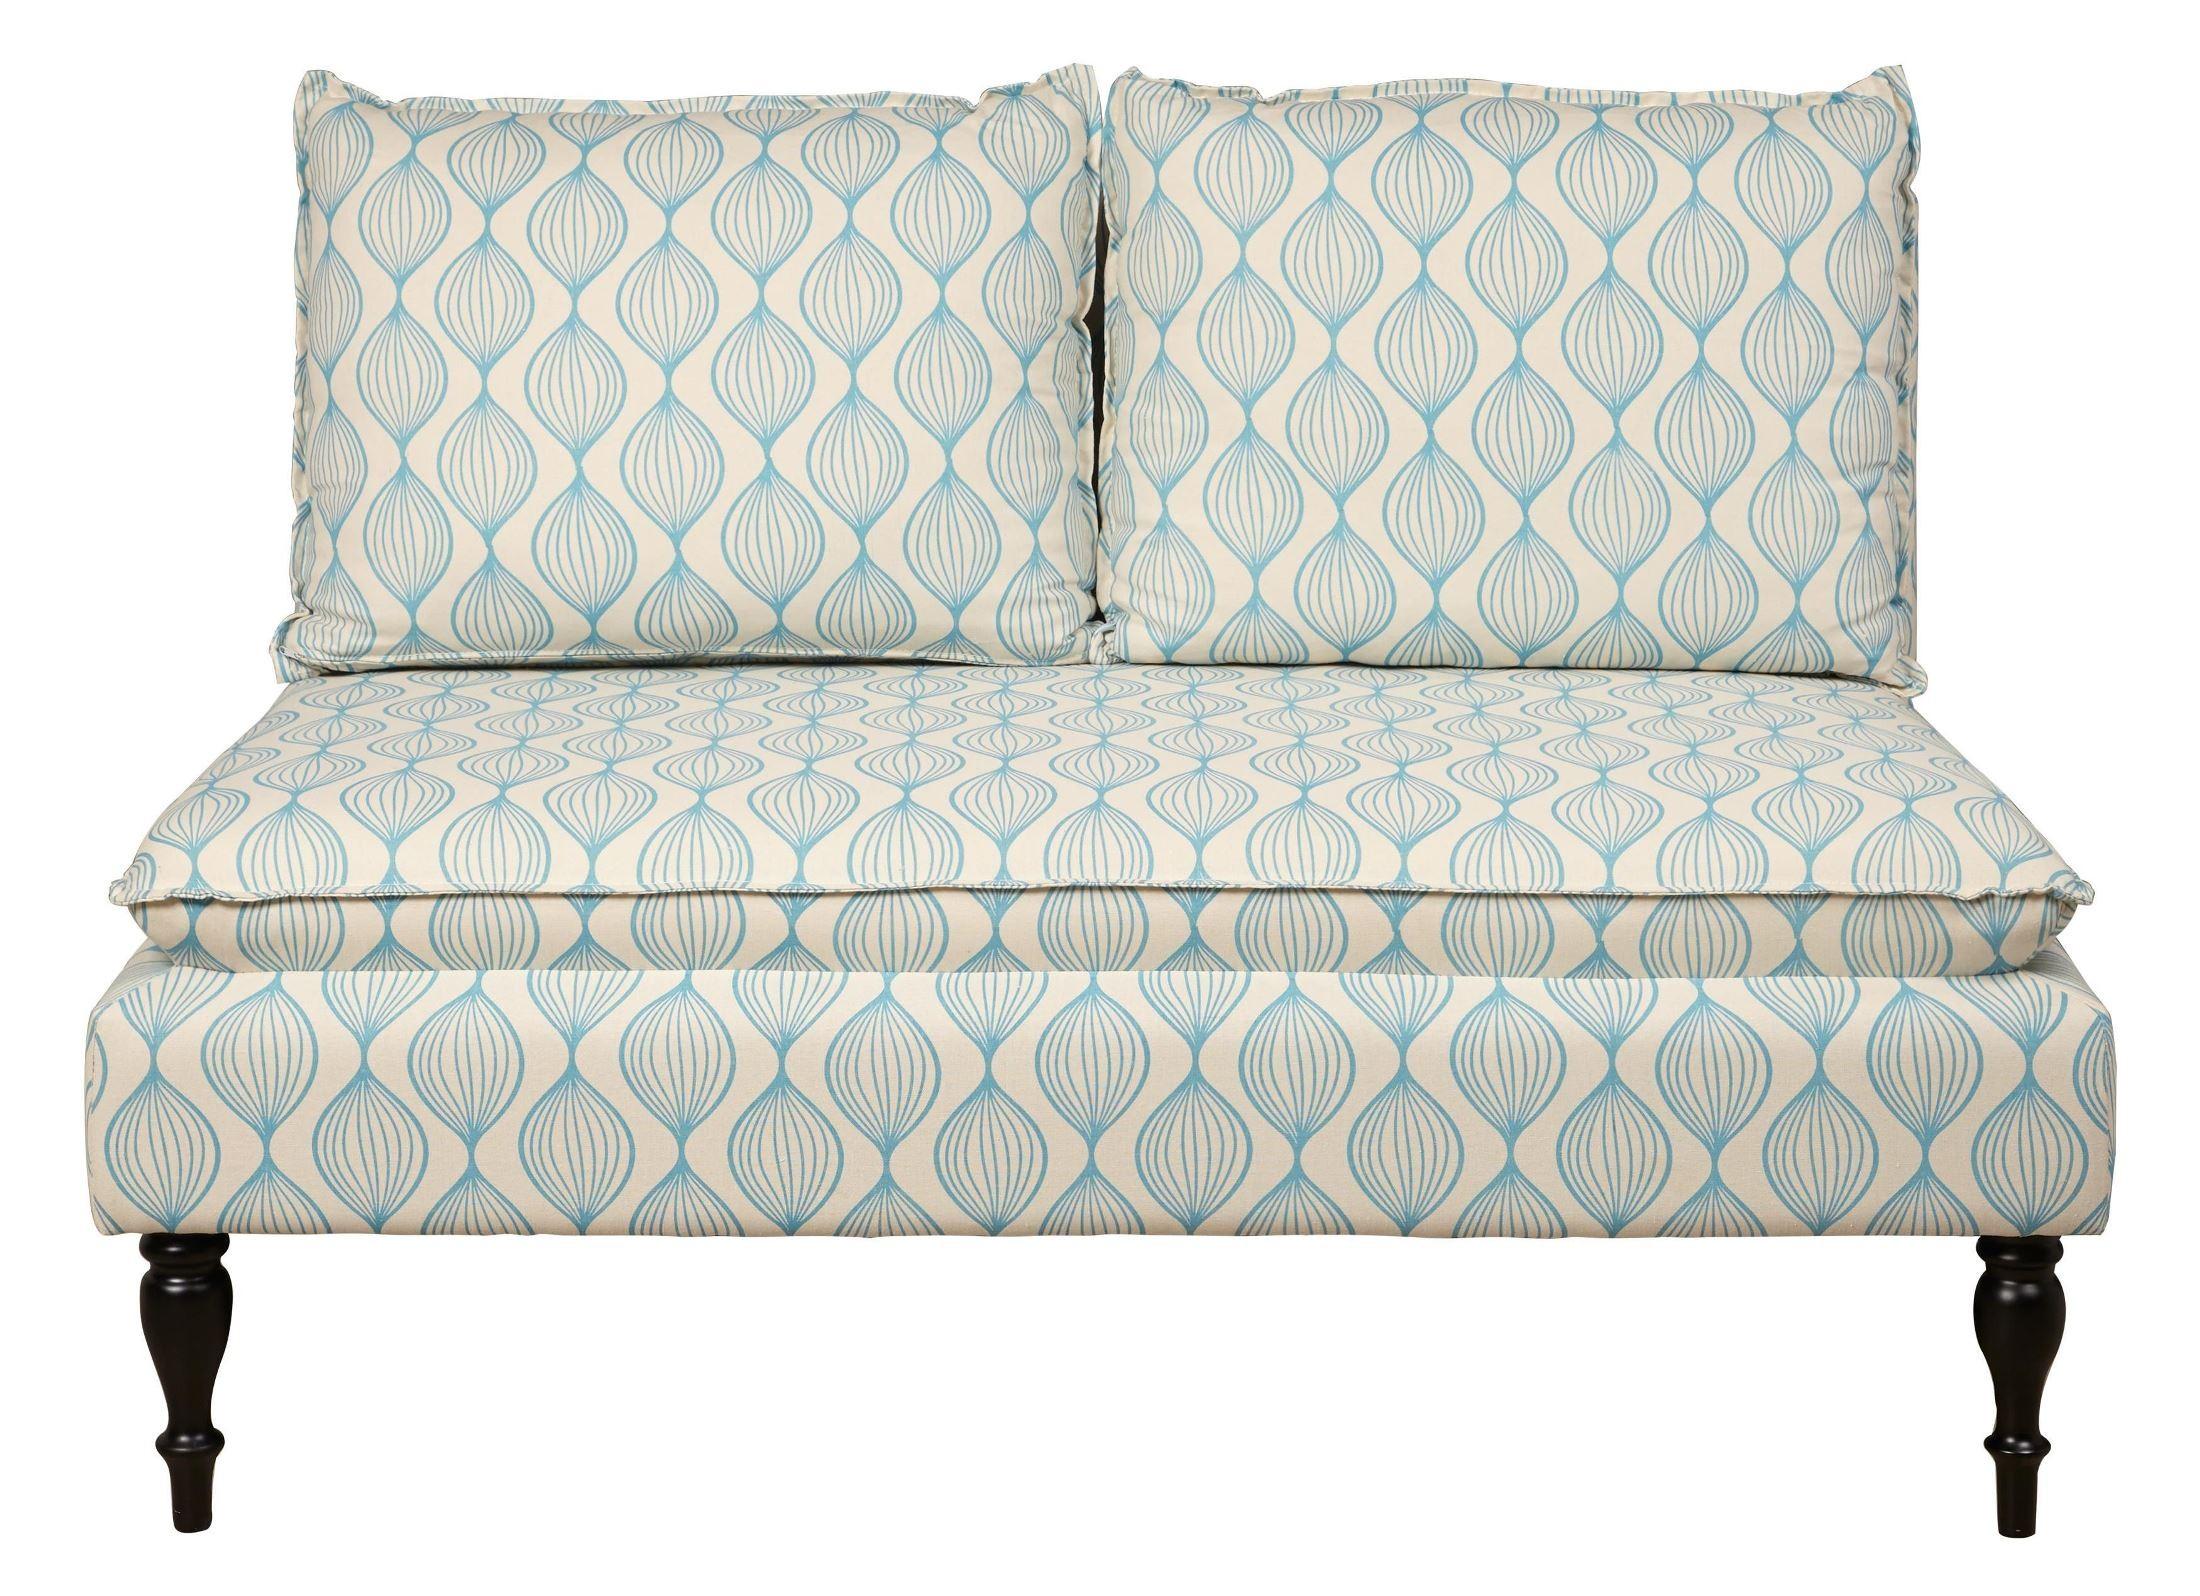 Upholstered Pattern Blue Banquette Bench From Pulaski Coleman Furniture